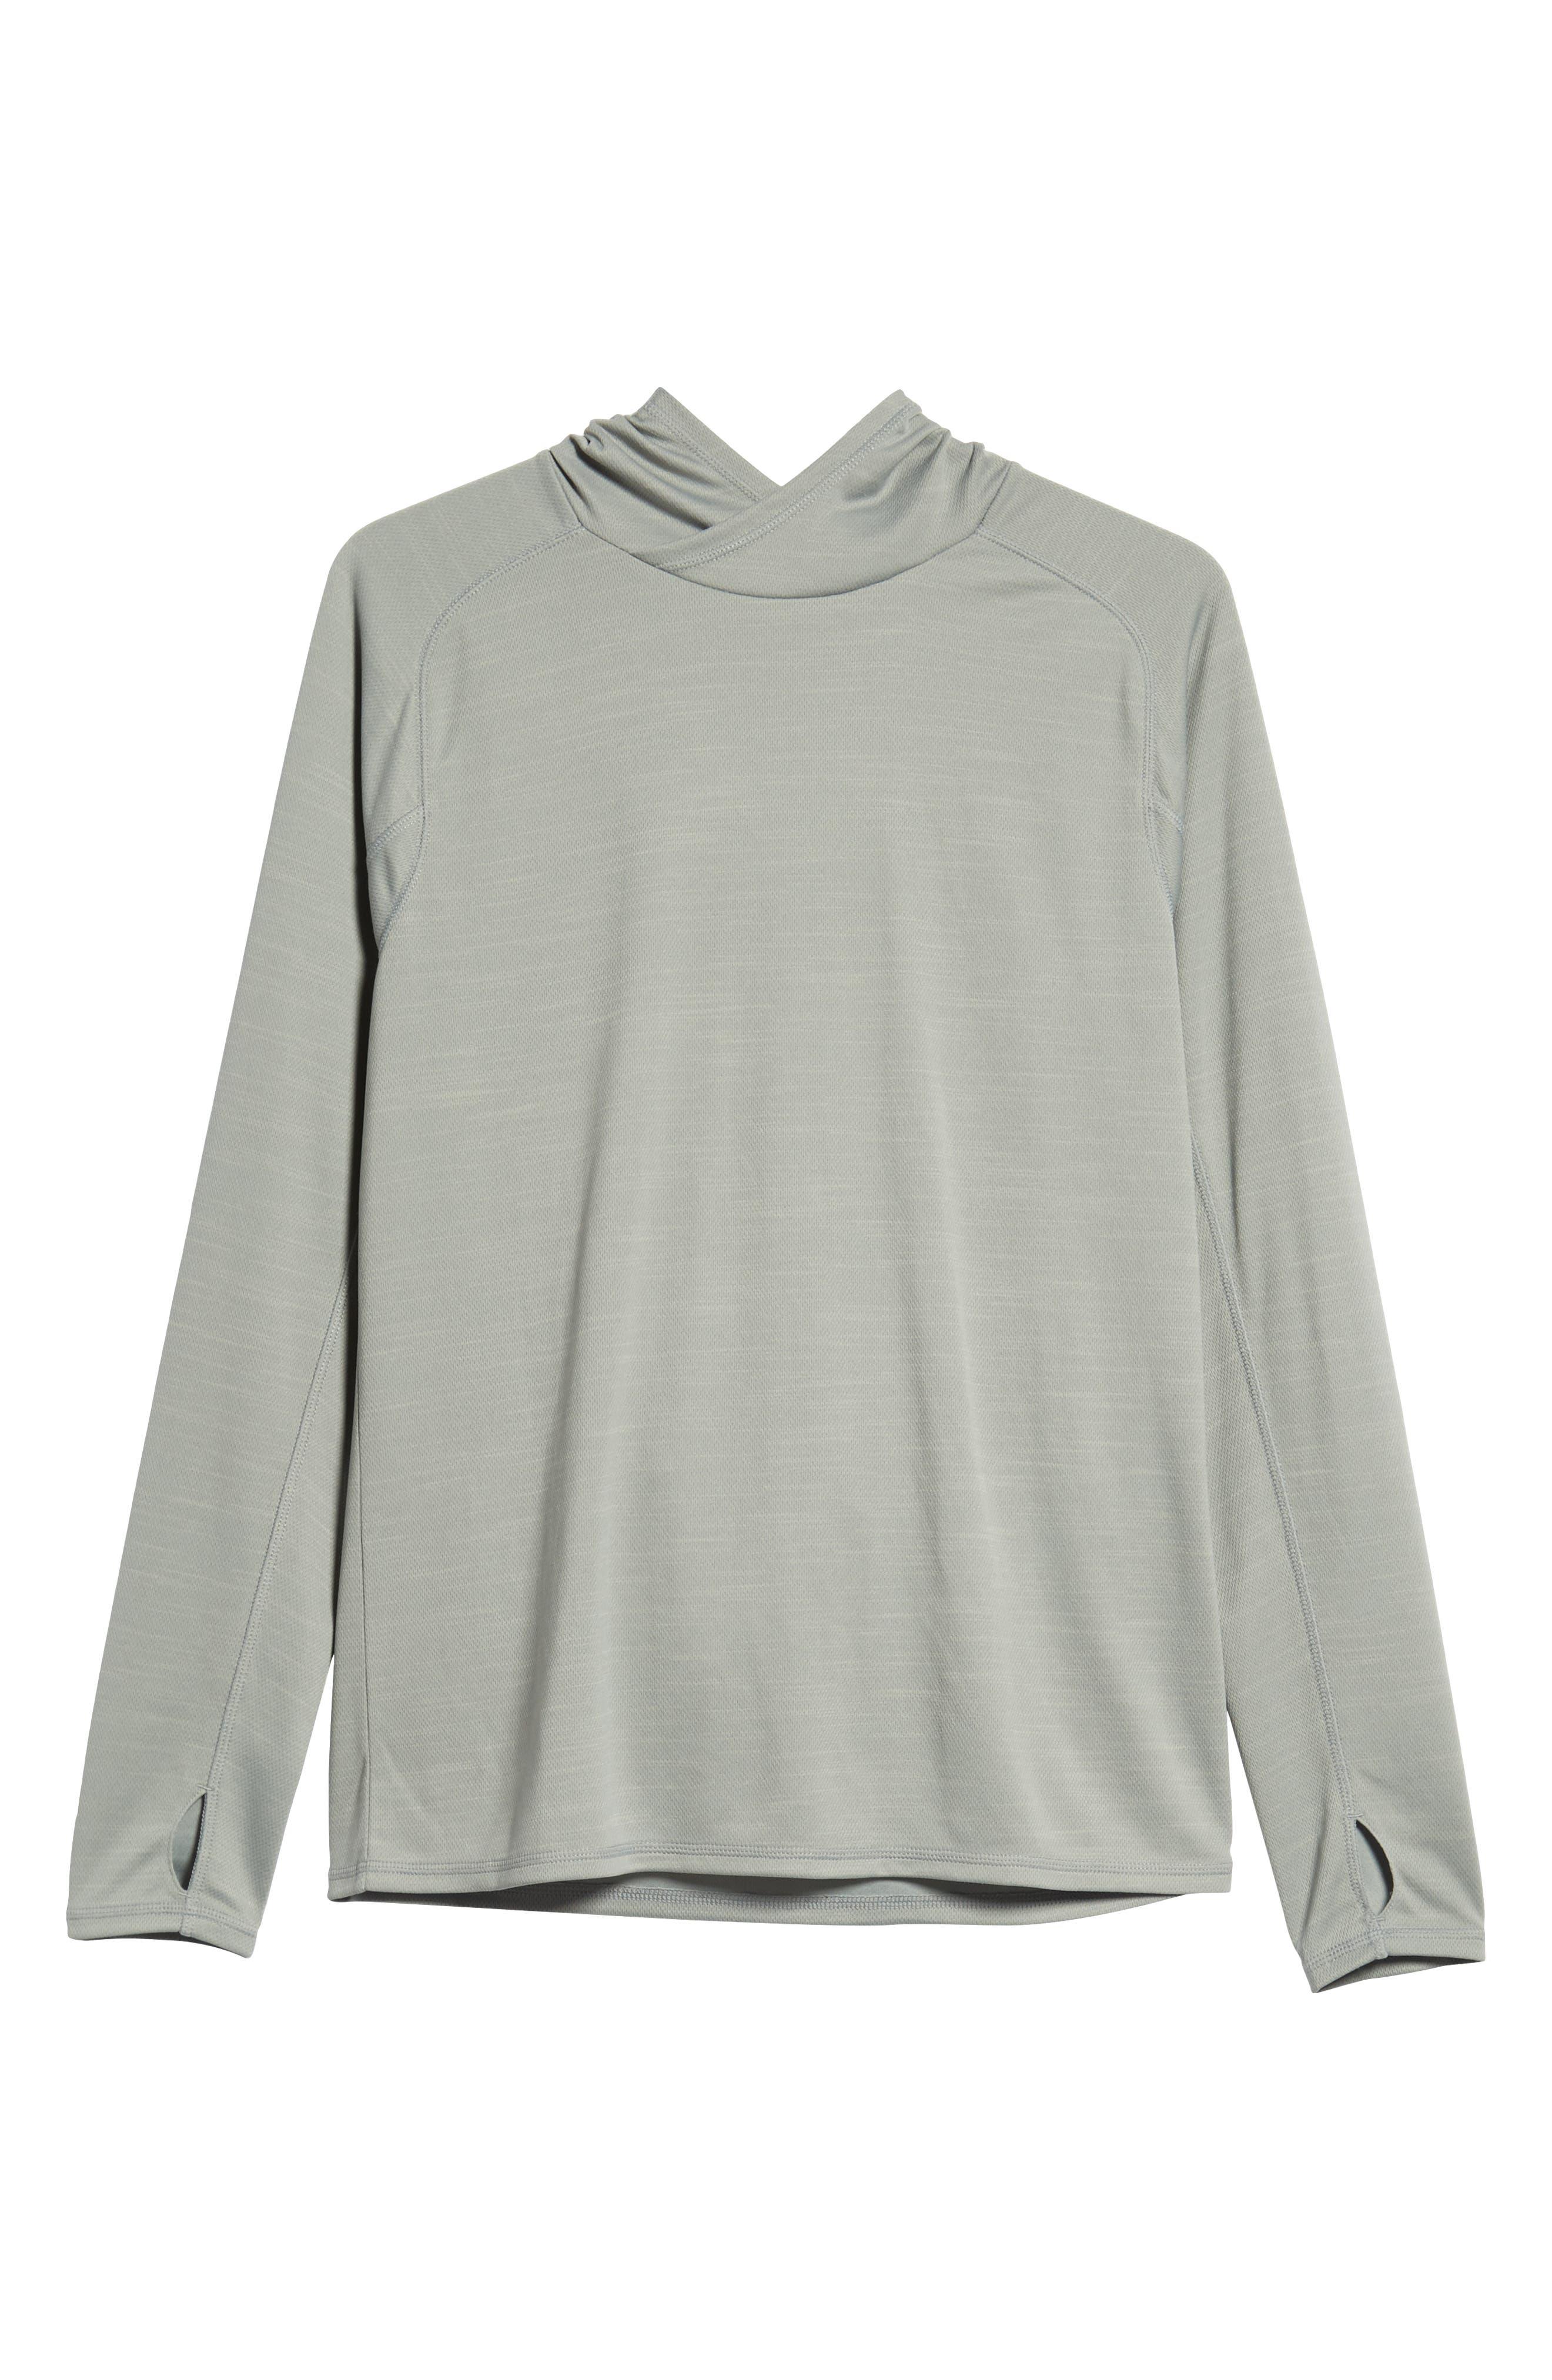 Hooded Pullover,                             Alternate thumbnail 6, color,                             GREY ZIRCON SPACEDYE